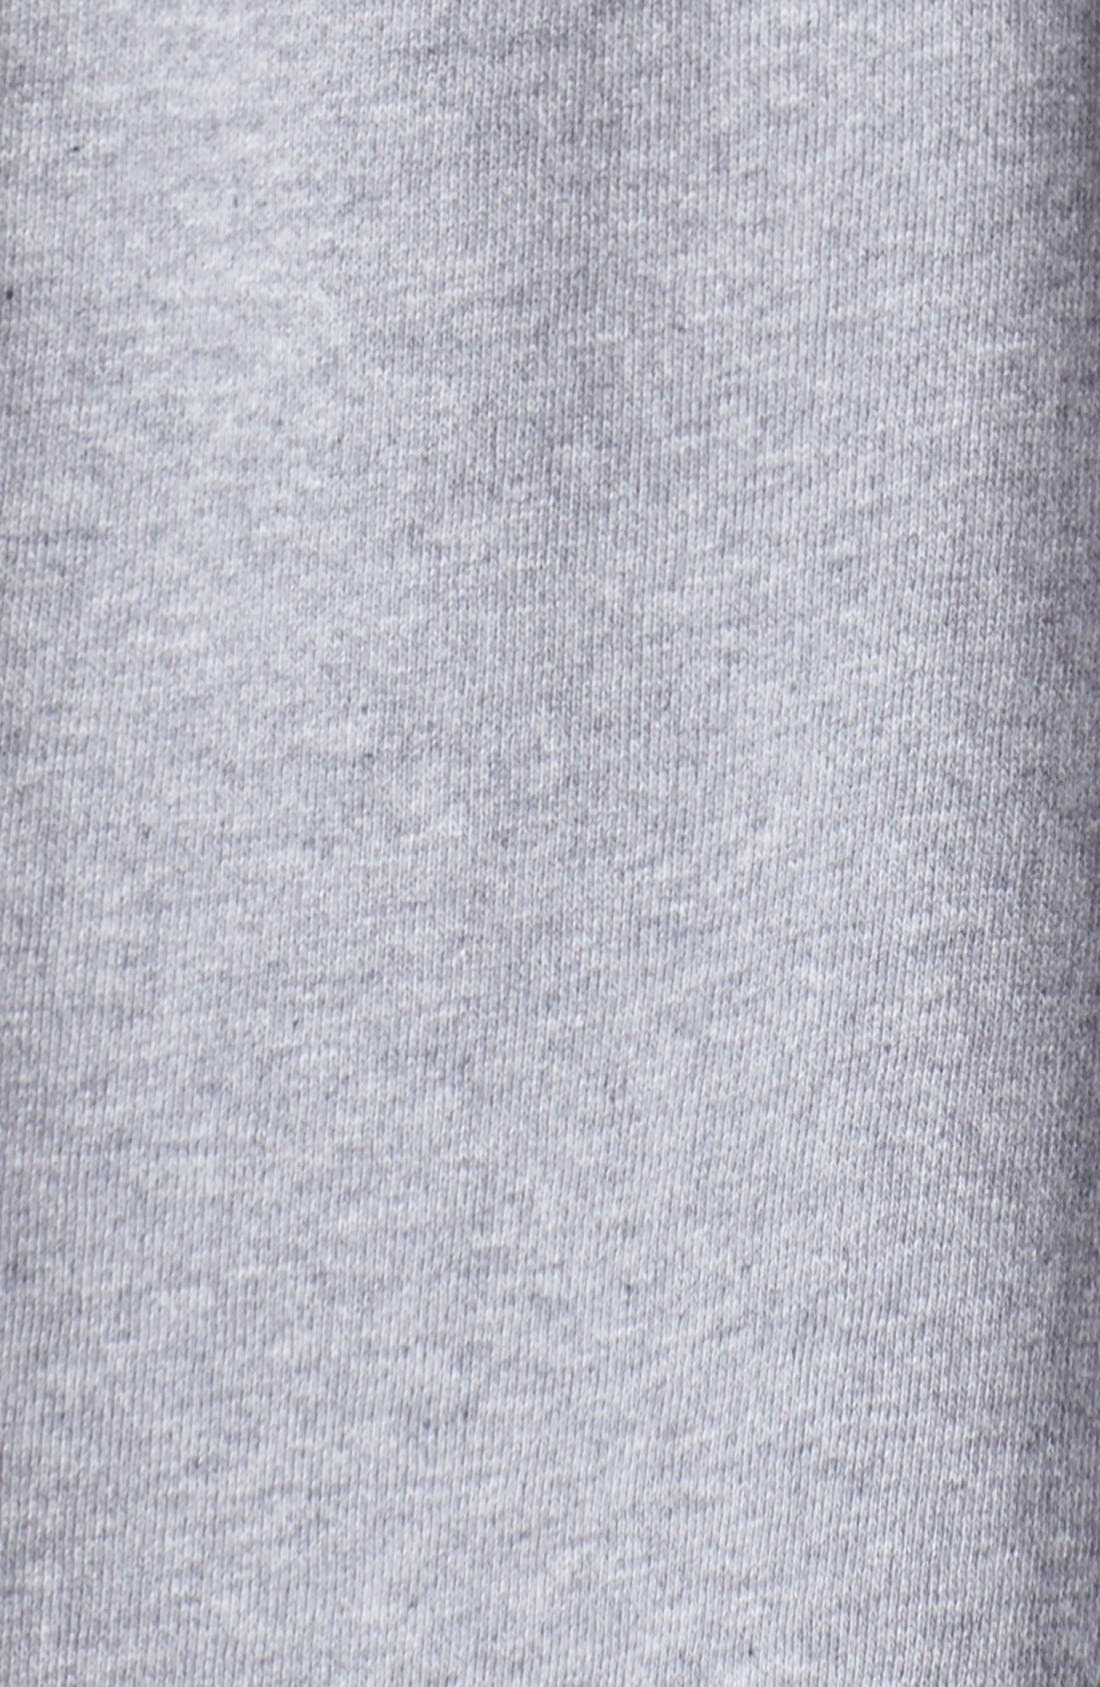 Alternate Image 3  - Mitchell & Ness 'Miami' Sweatshirt